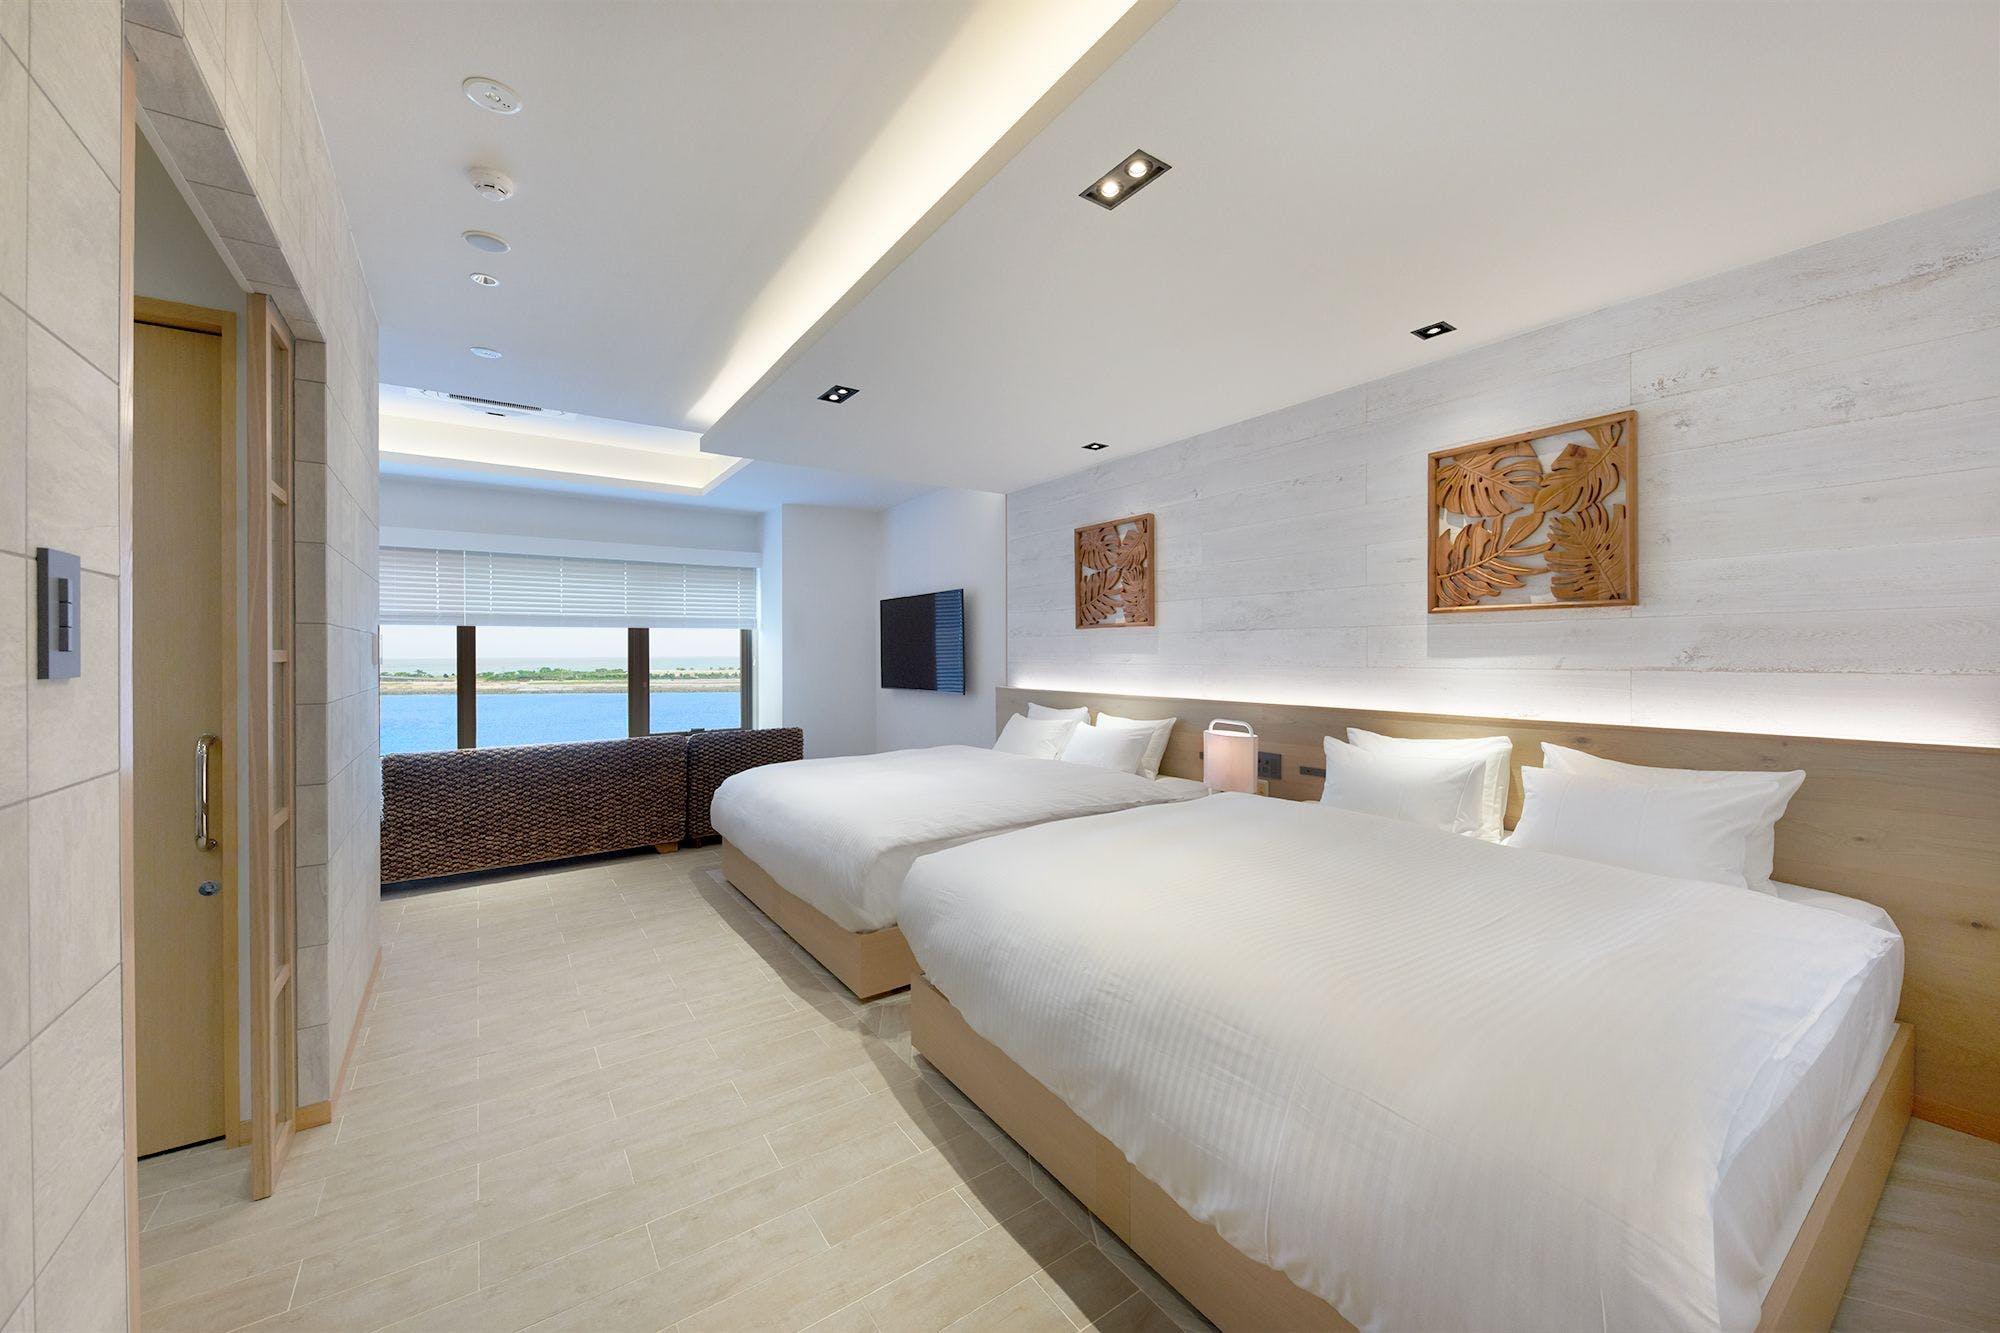 THIRD石垣島 / シービューワイドリビングジュニアスイート